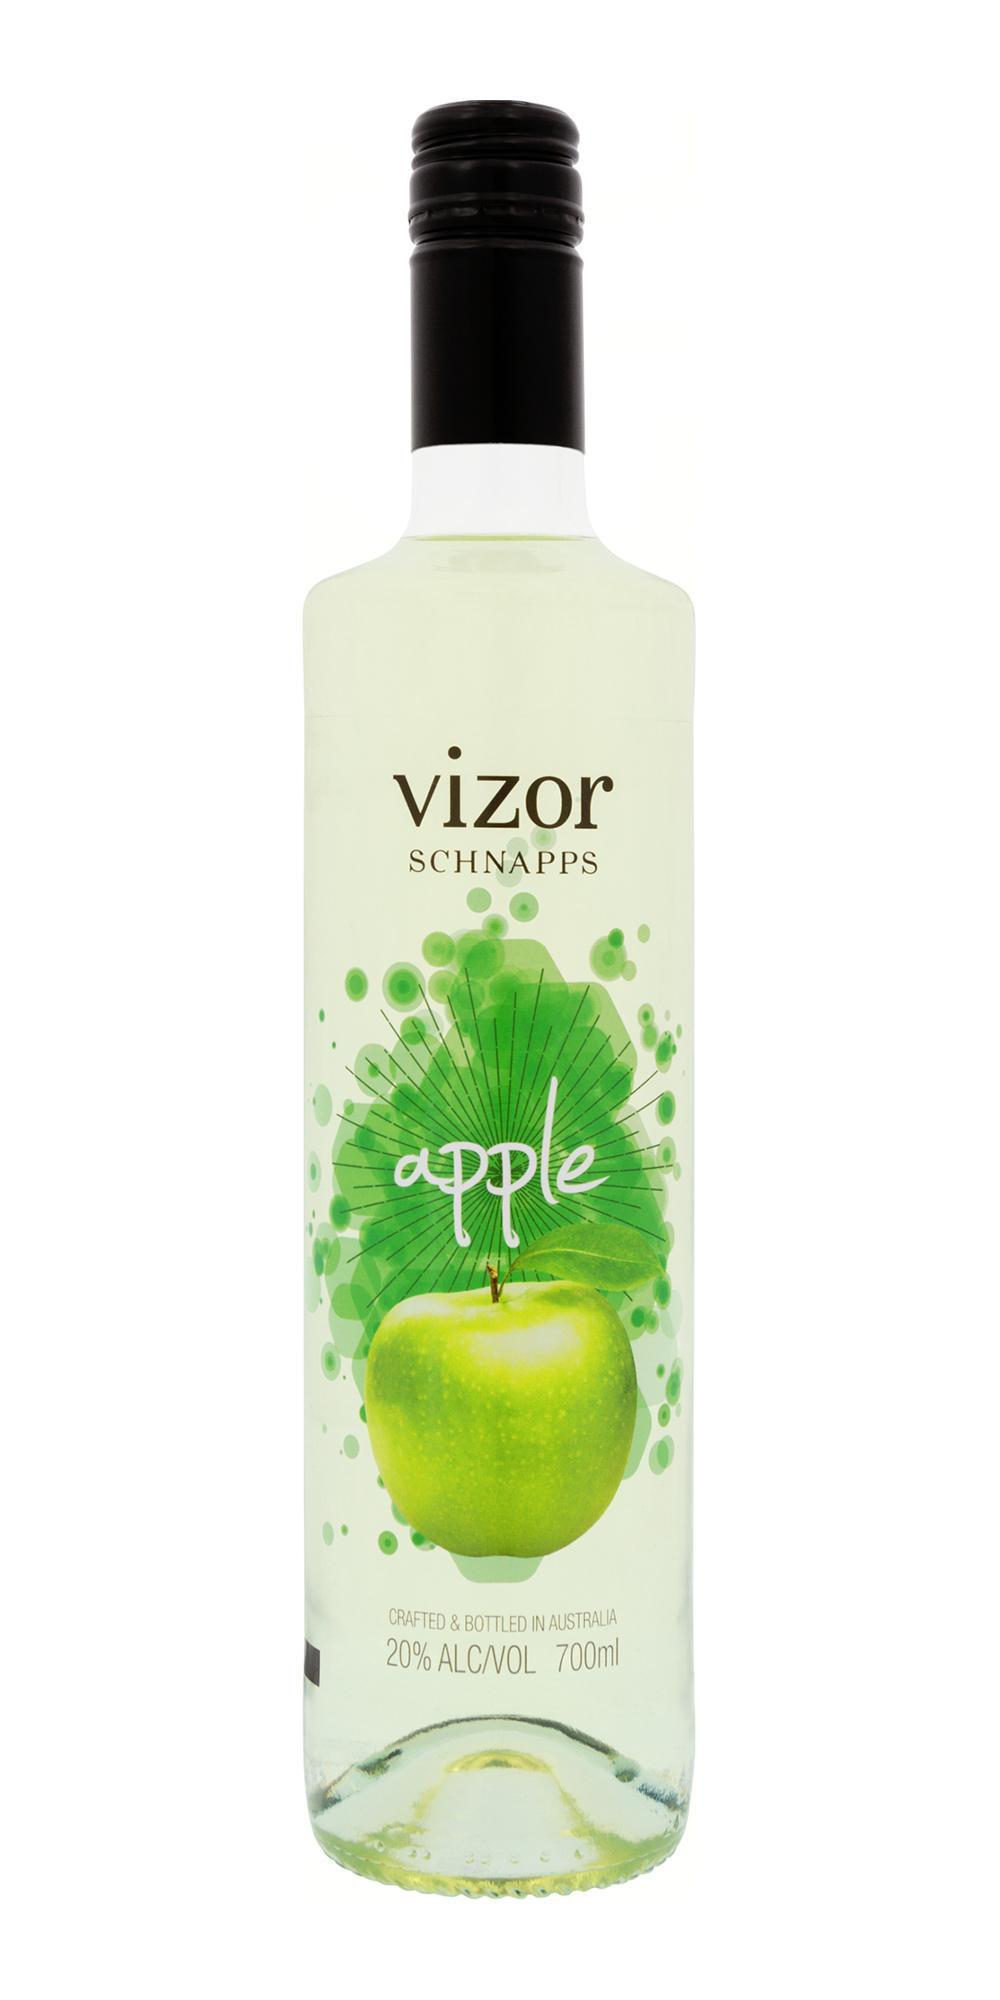 Vizor Apple Schnapps